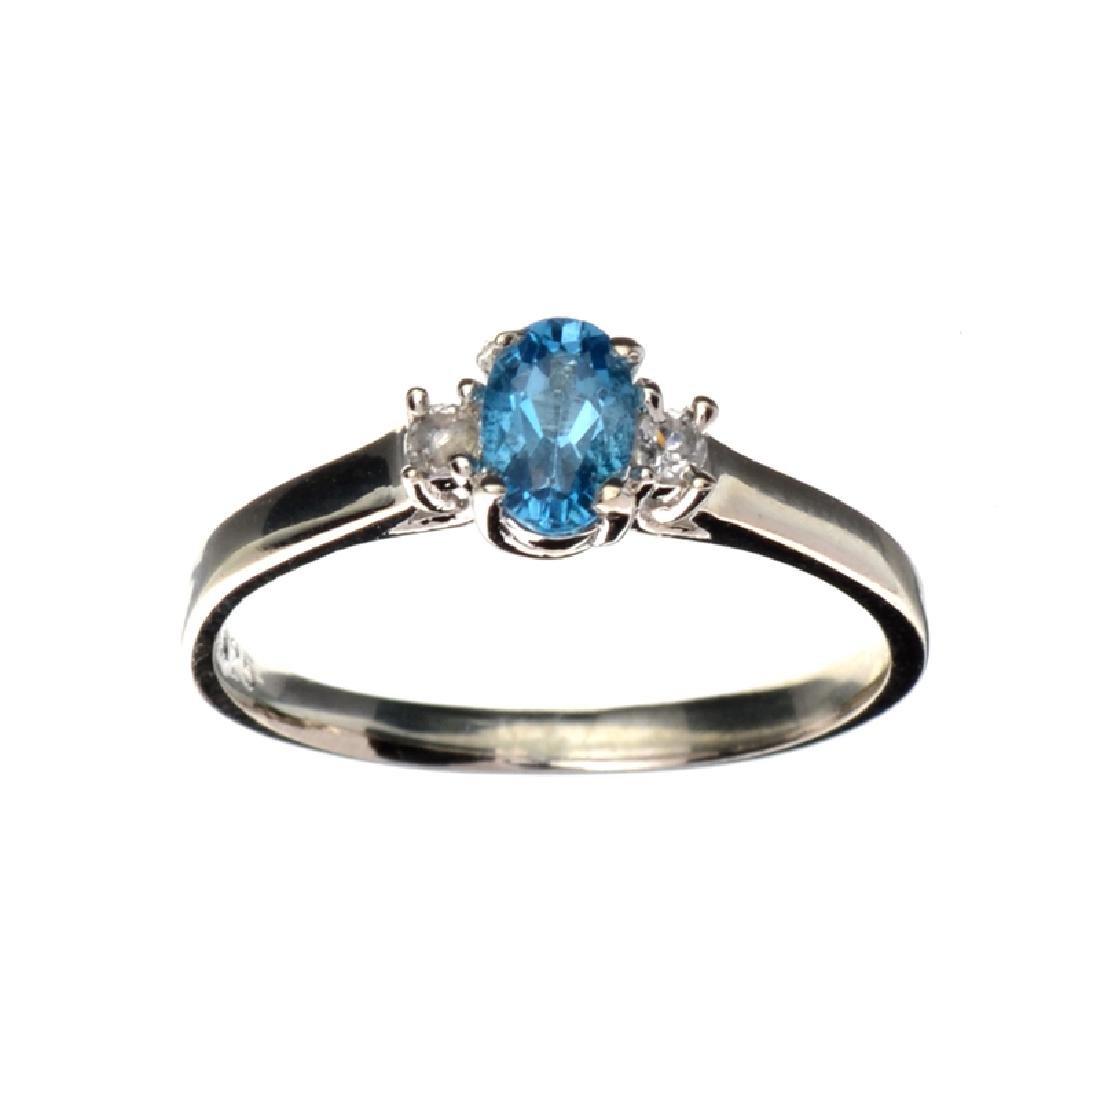 APP: 0.6k Fine Jewelry 0.62CT Oval Cut Blue Topaz And